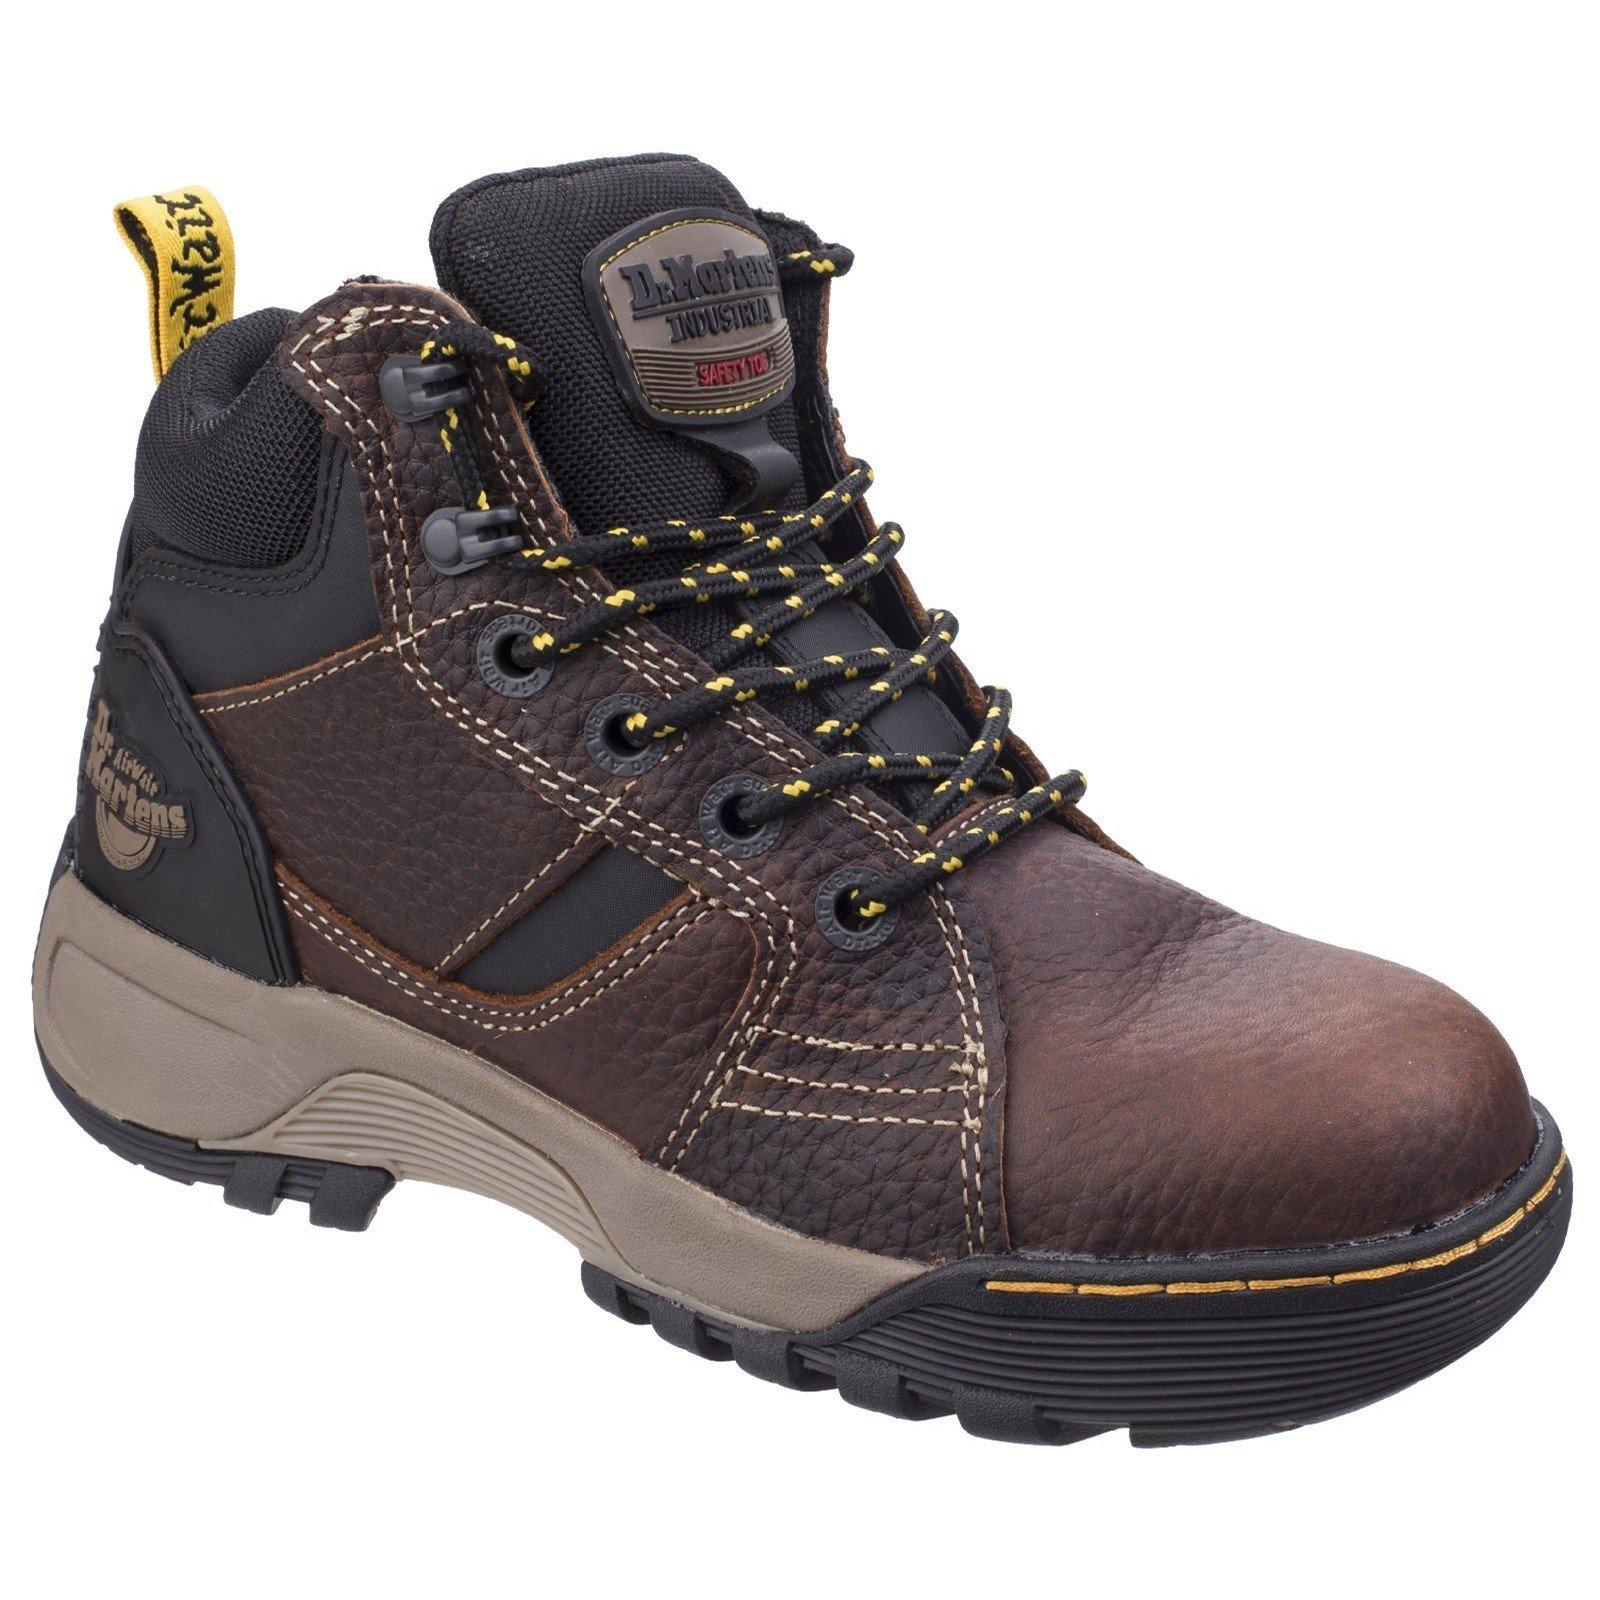 Dr Martens Men's Grapple Safety Boot Various Colours 26023 - Teak 6